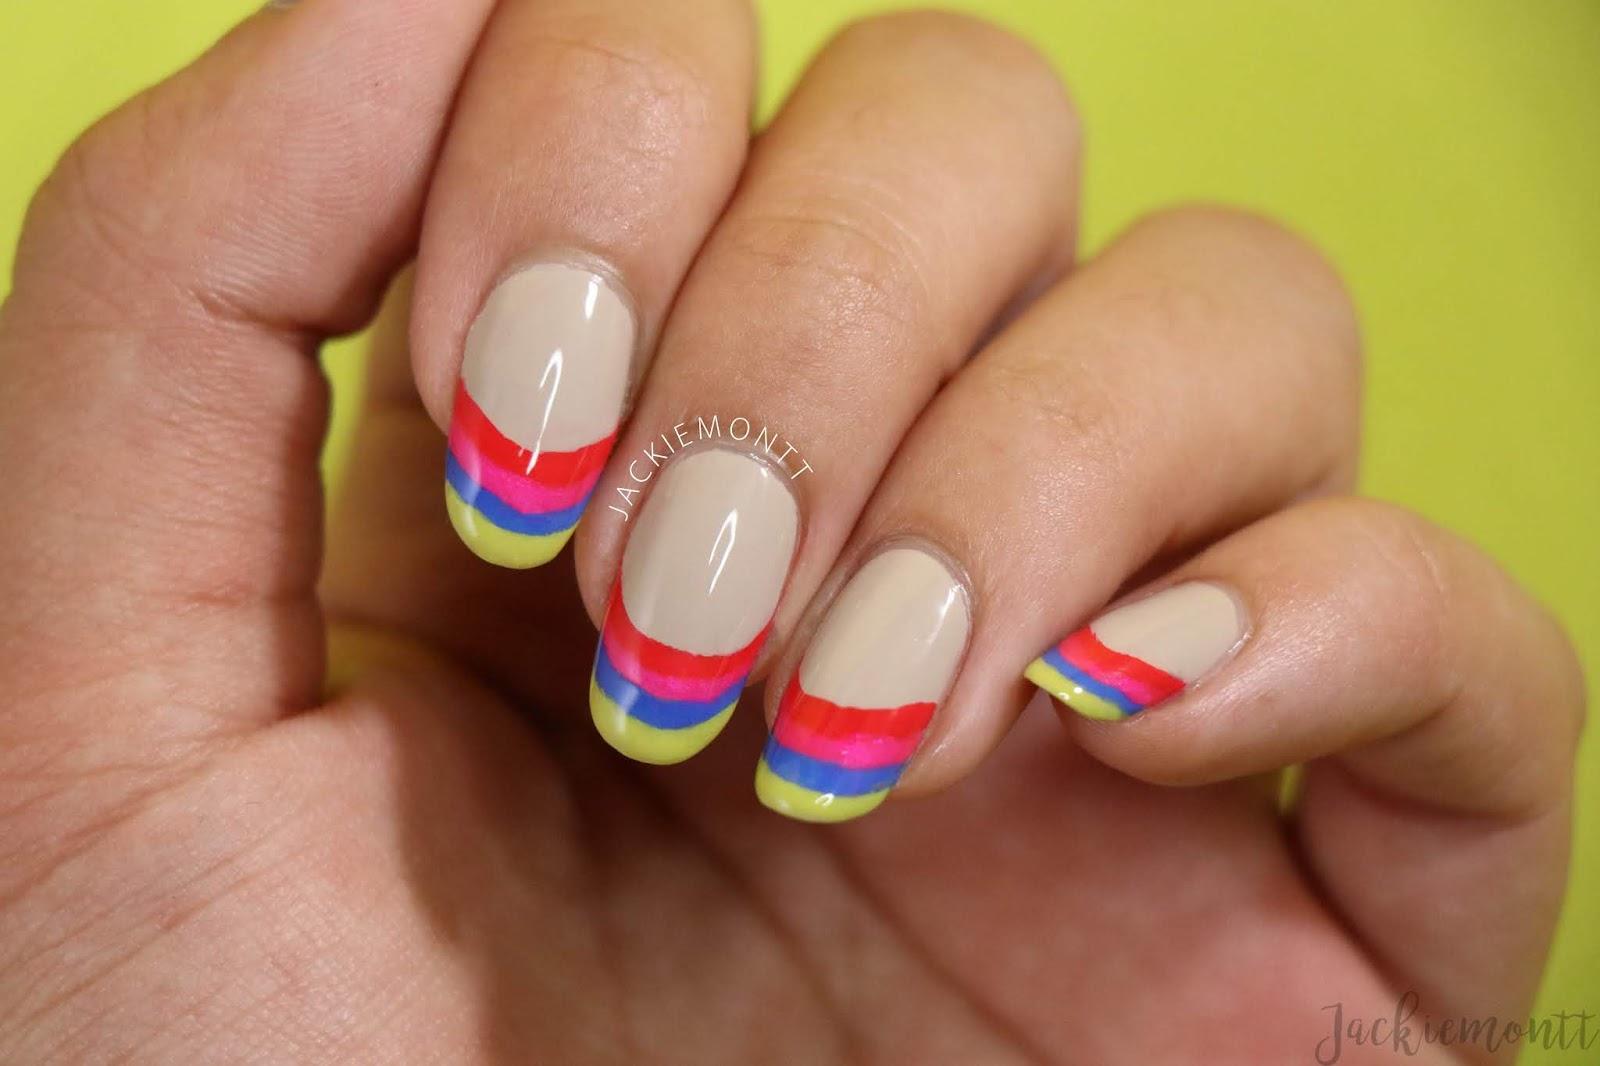 Tropical Tips Nail Art Tutorial - JACKIEMONTT